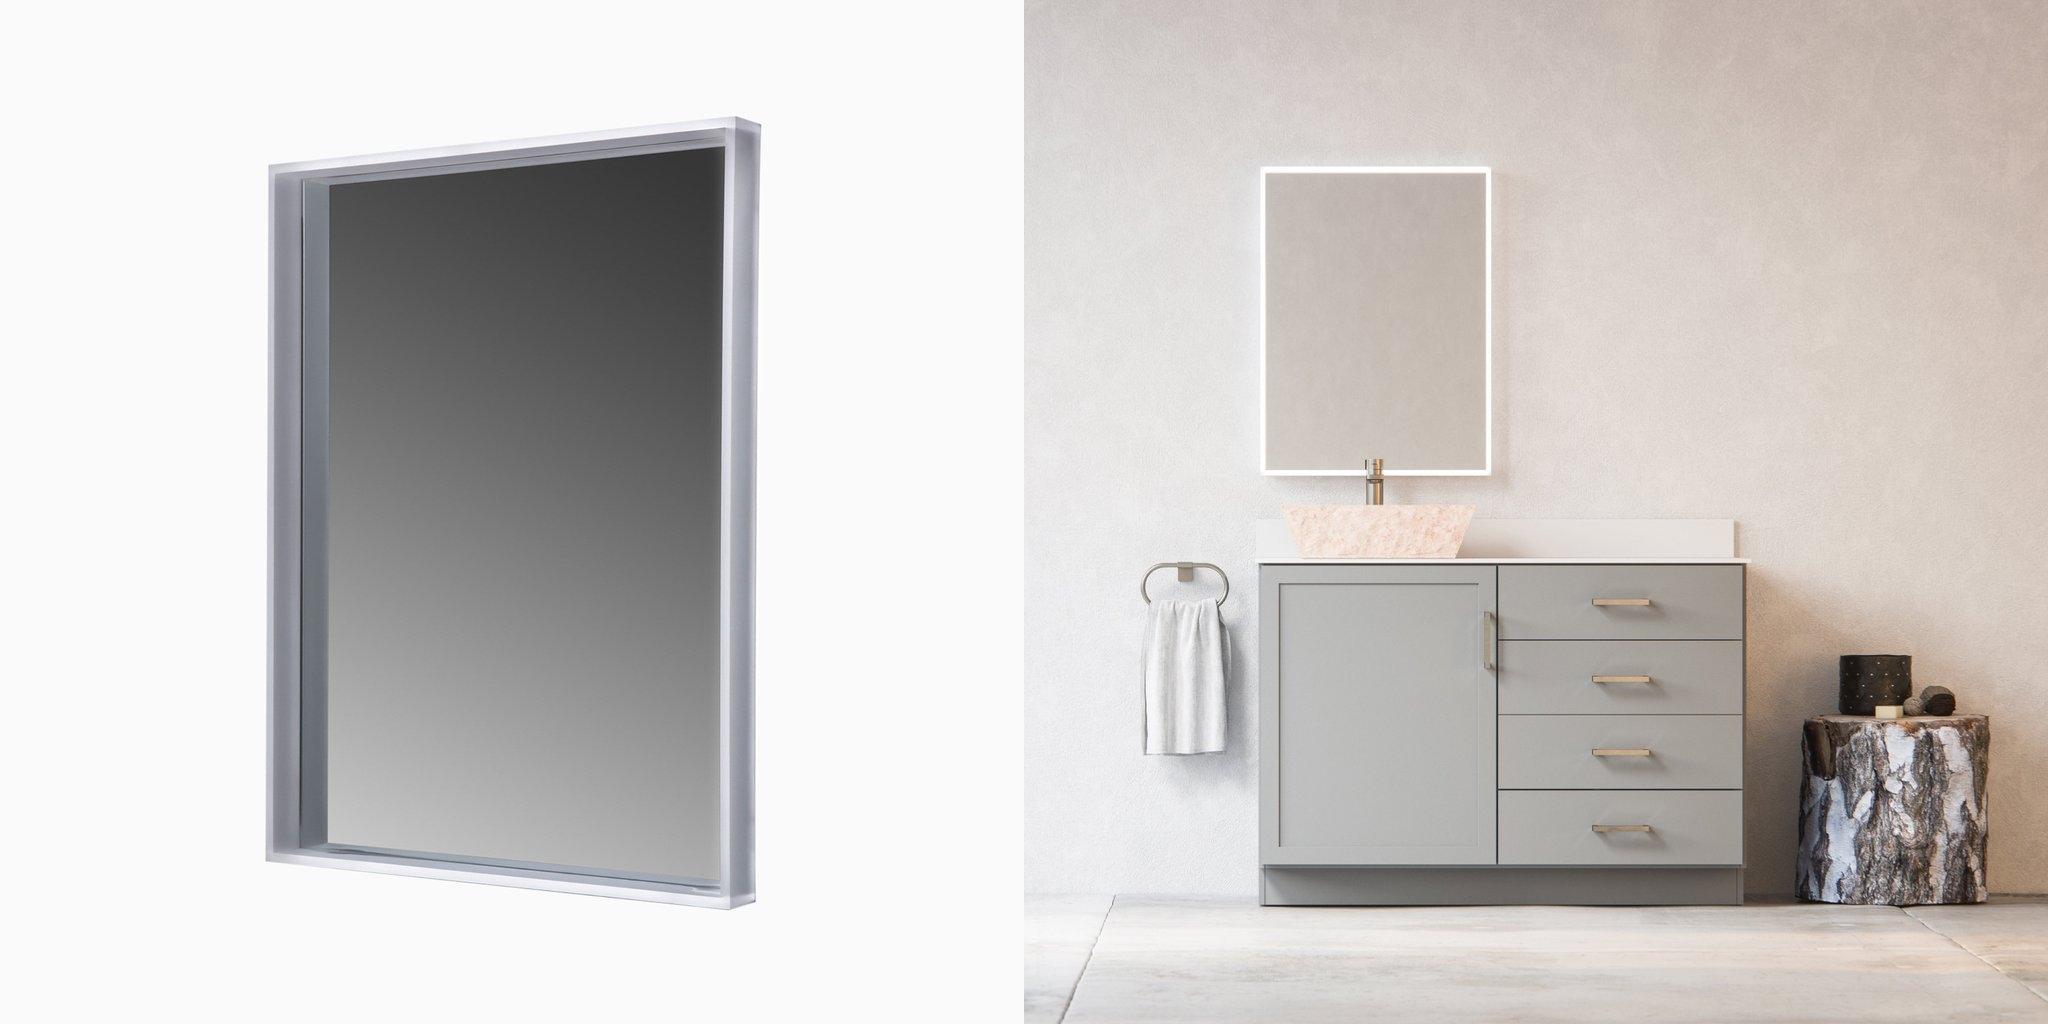 led mirror wit shelf